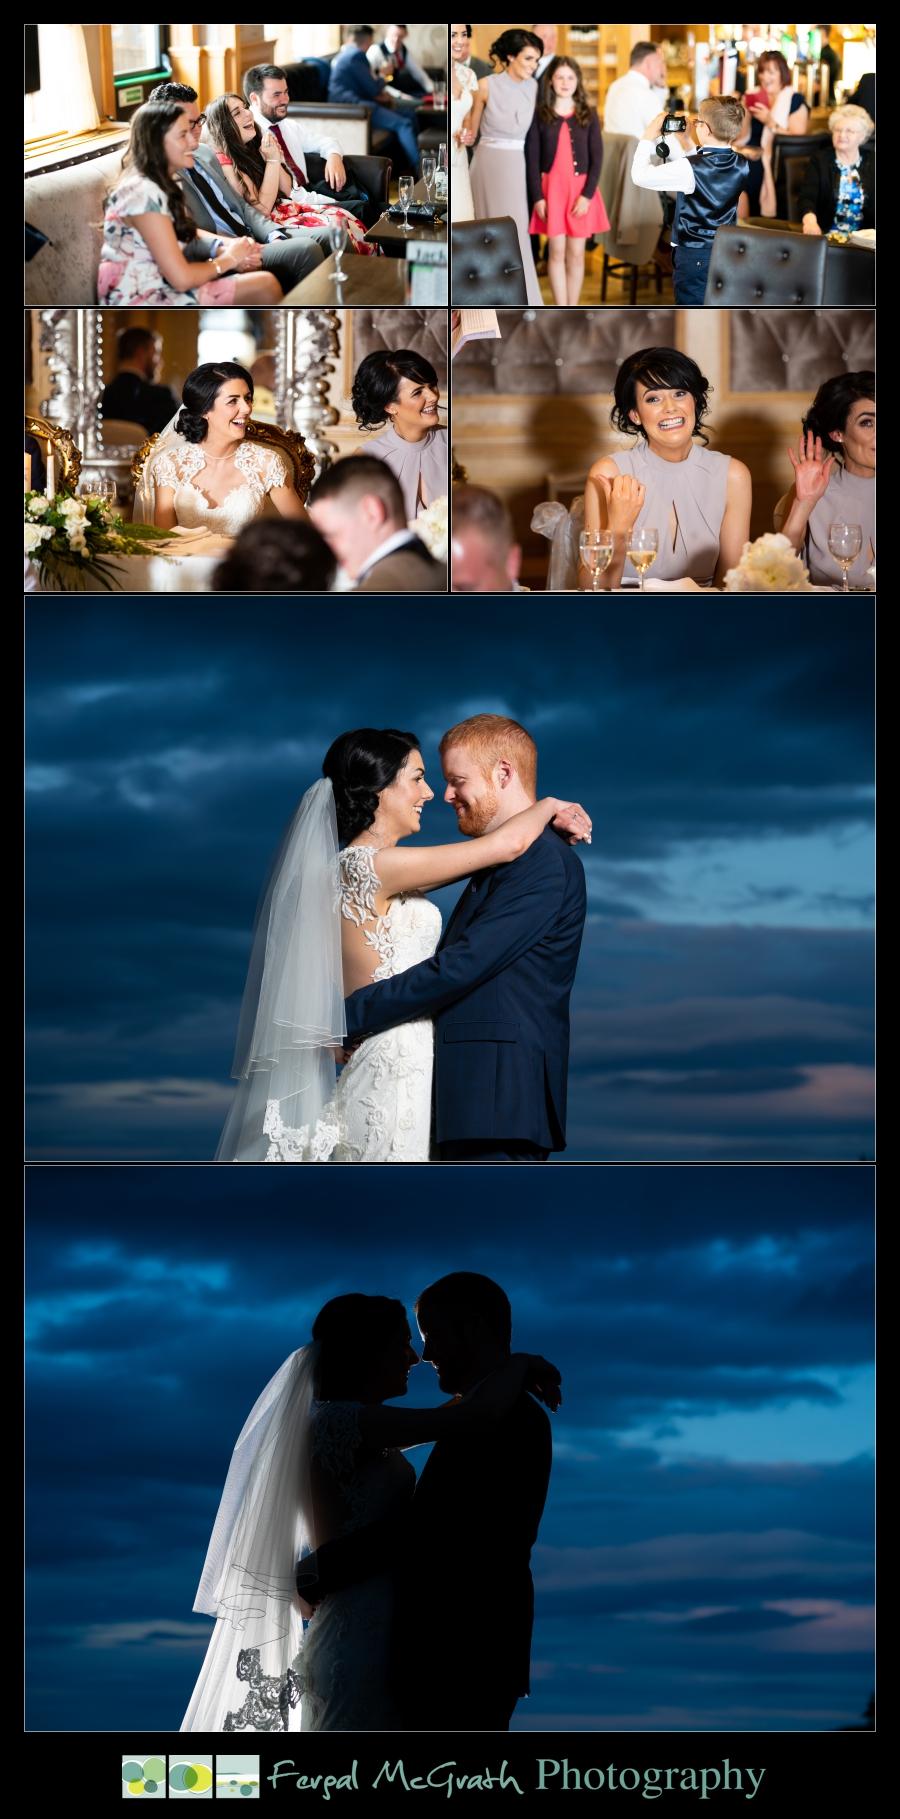 Ballyliffin Lodge Hotel Weddings bride and groom sunset photos